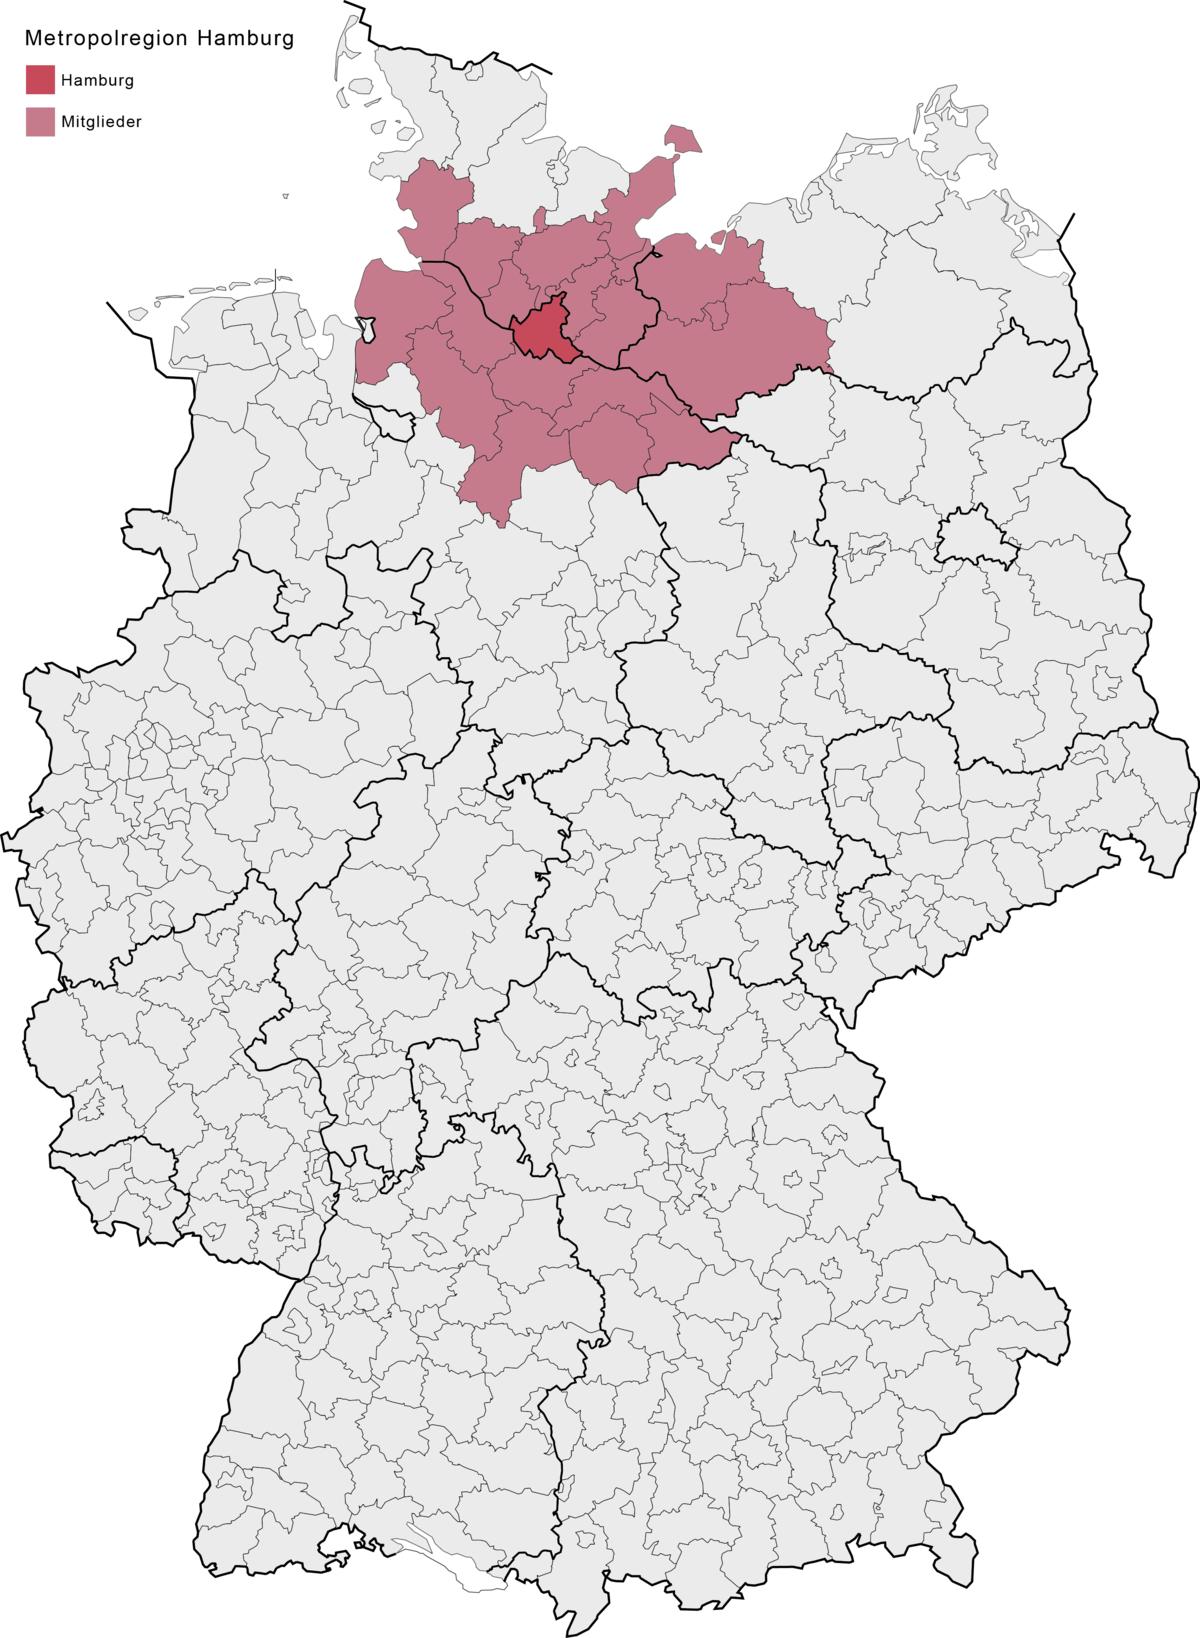 karta nemacke hamburg Hamburg Metropolitan Region   Wikipedia karta nemacke hamburg